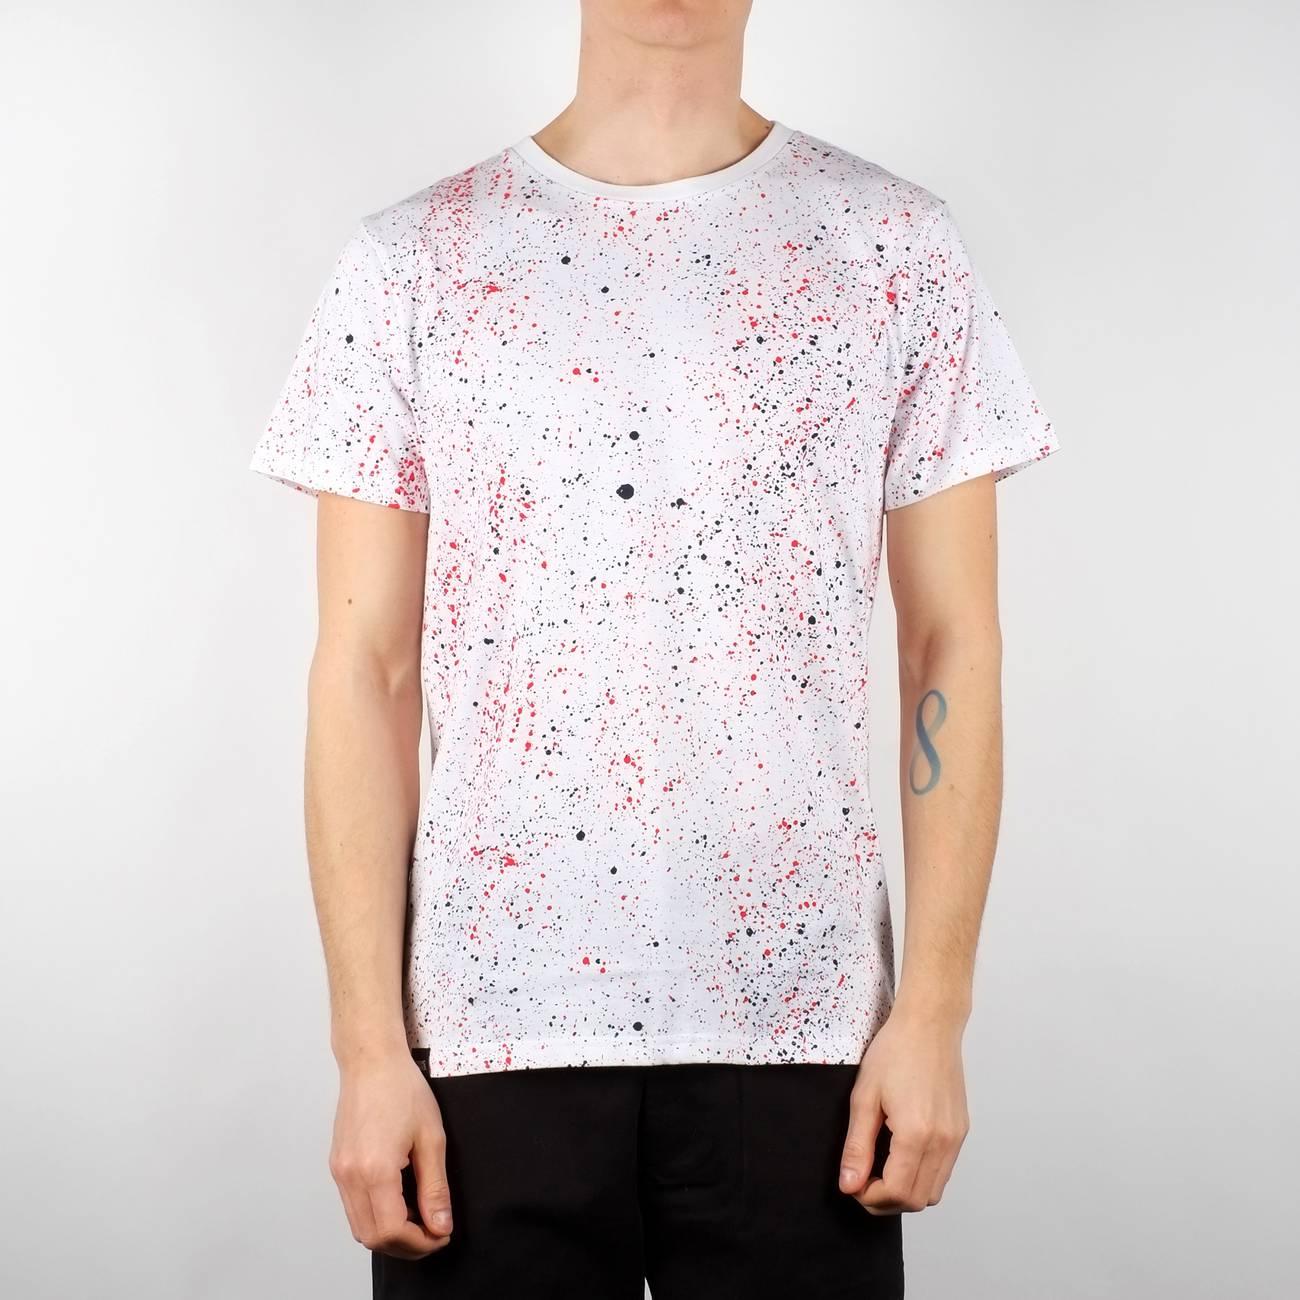 Stockholm T-shirt Spray Drips